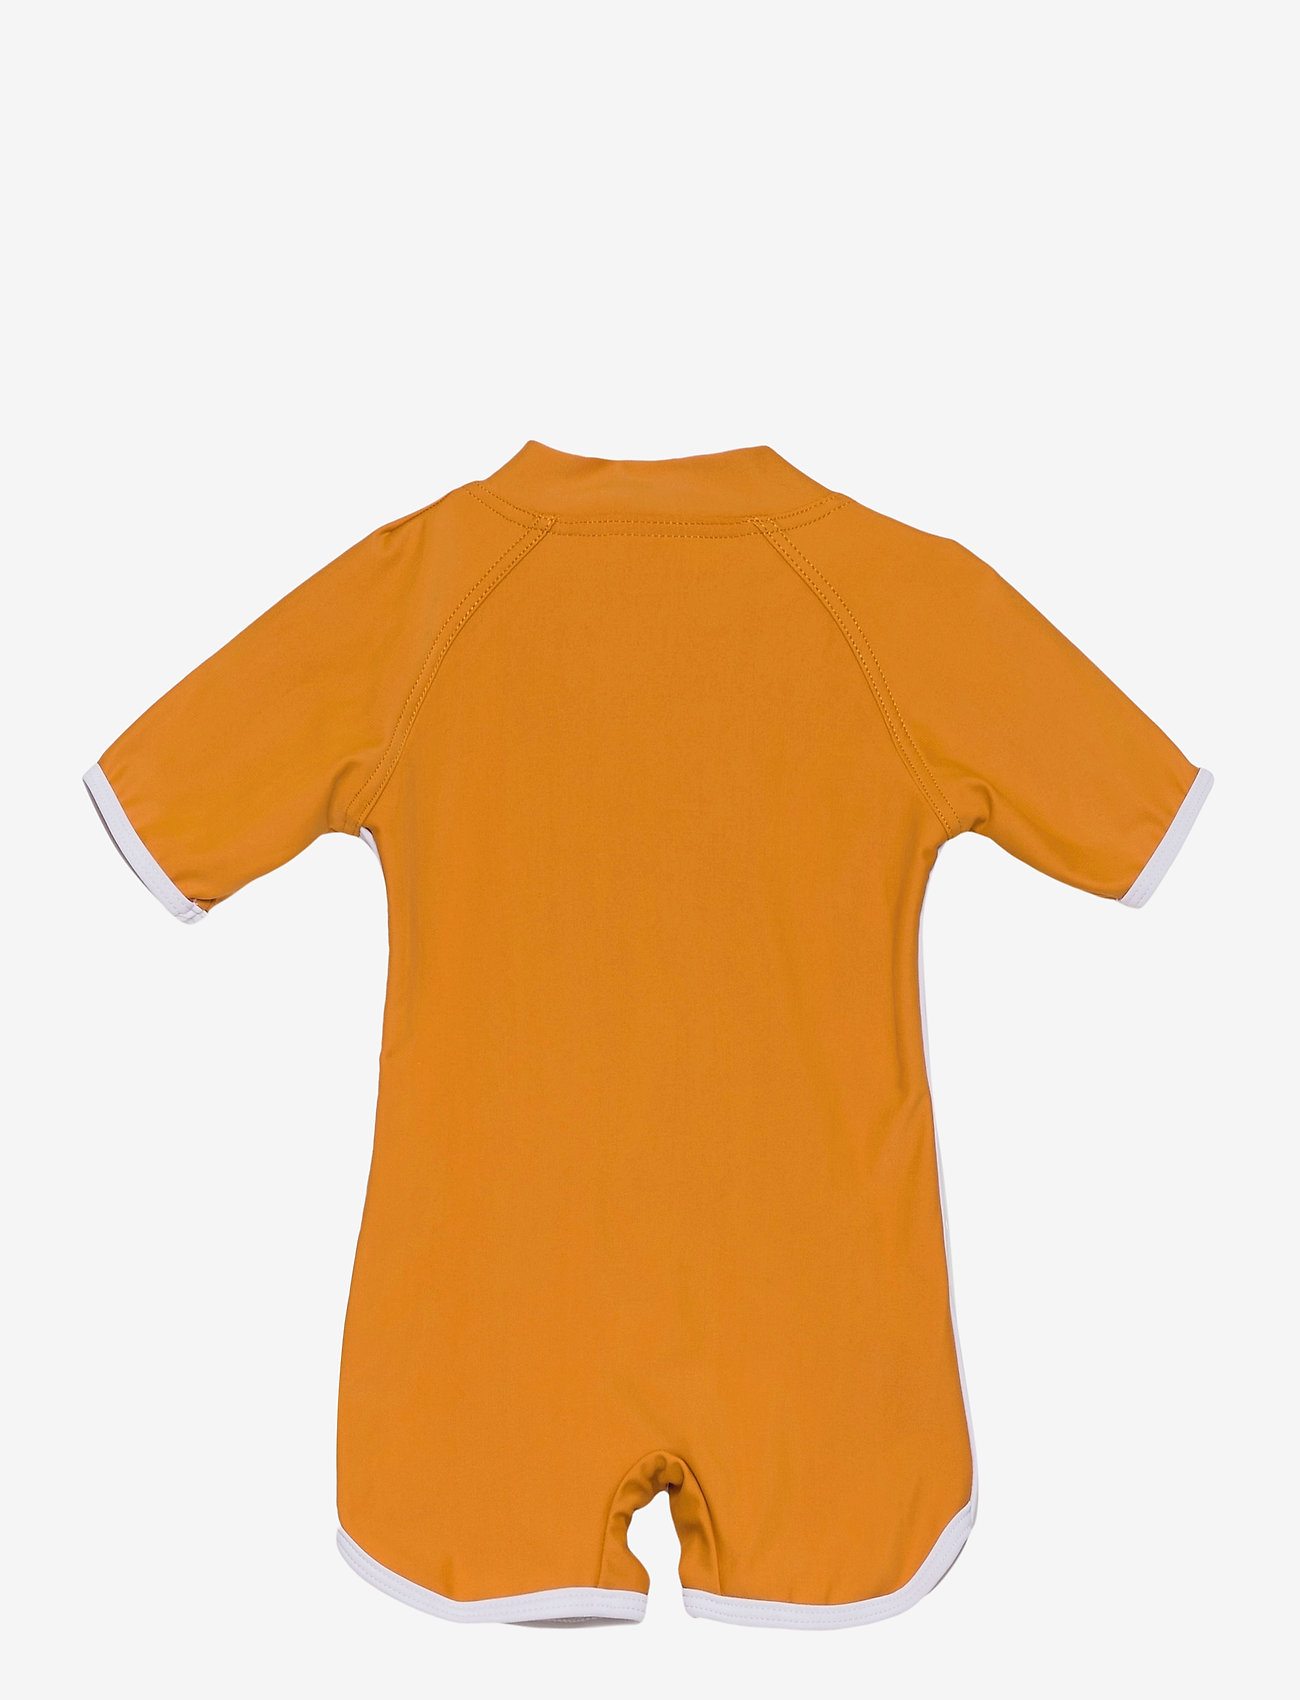 Liewood - Triton swim jumpsuit - jednoczęściowe - mustard - 1